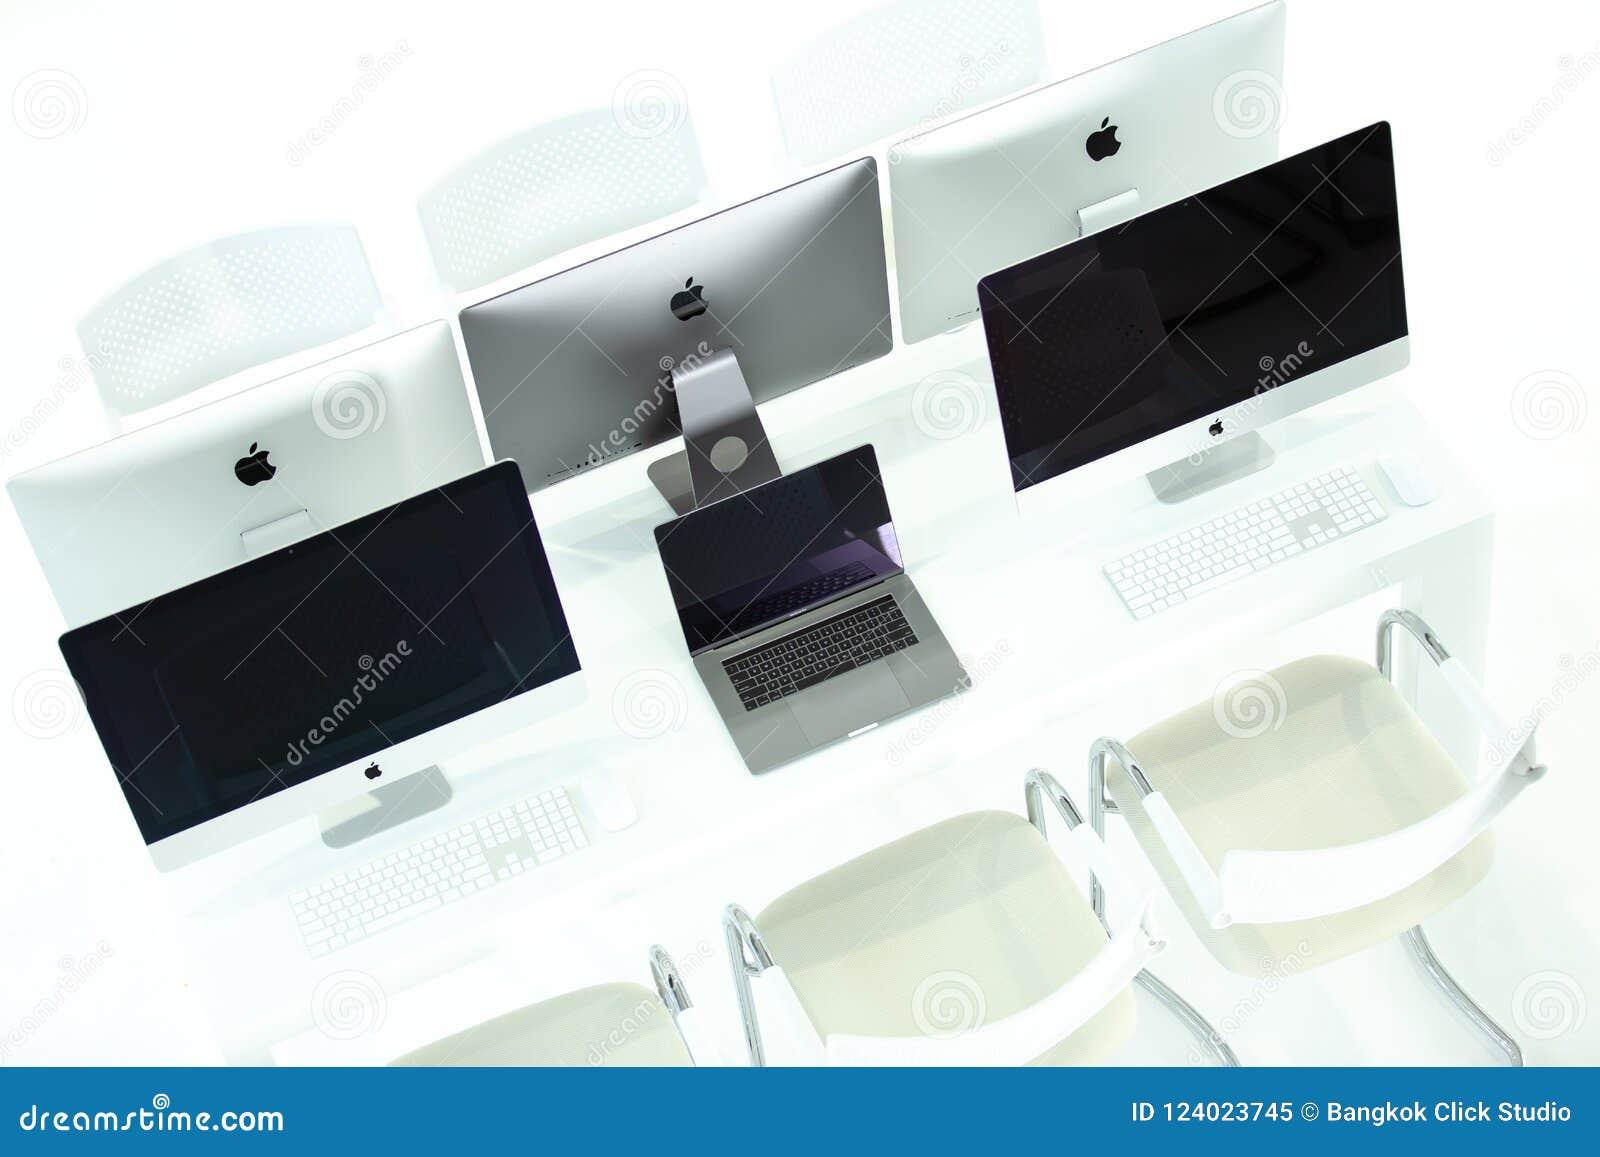 Imac imac pro e macbook pro